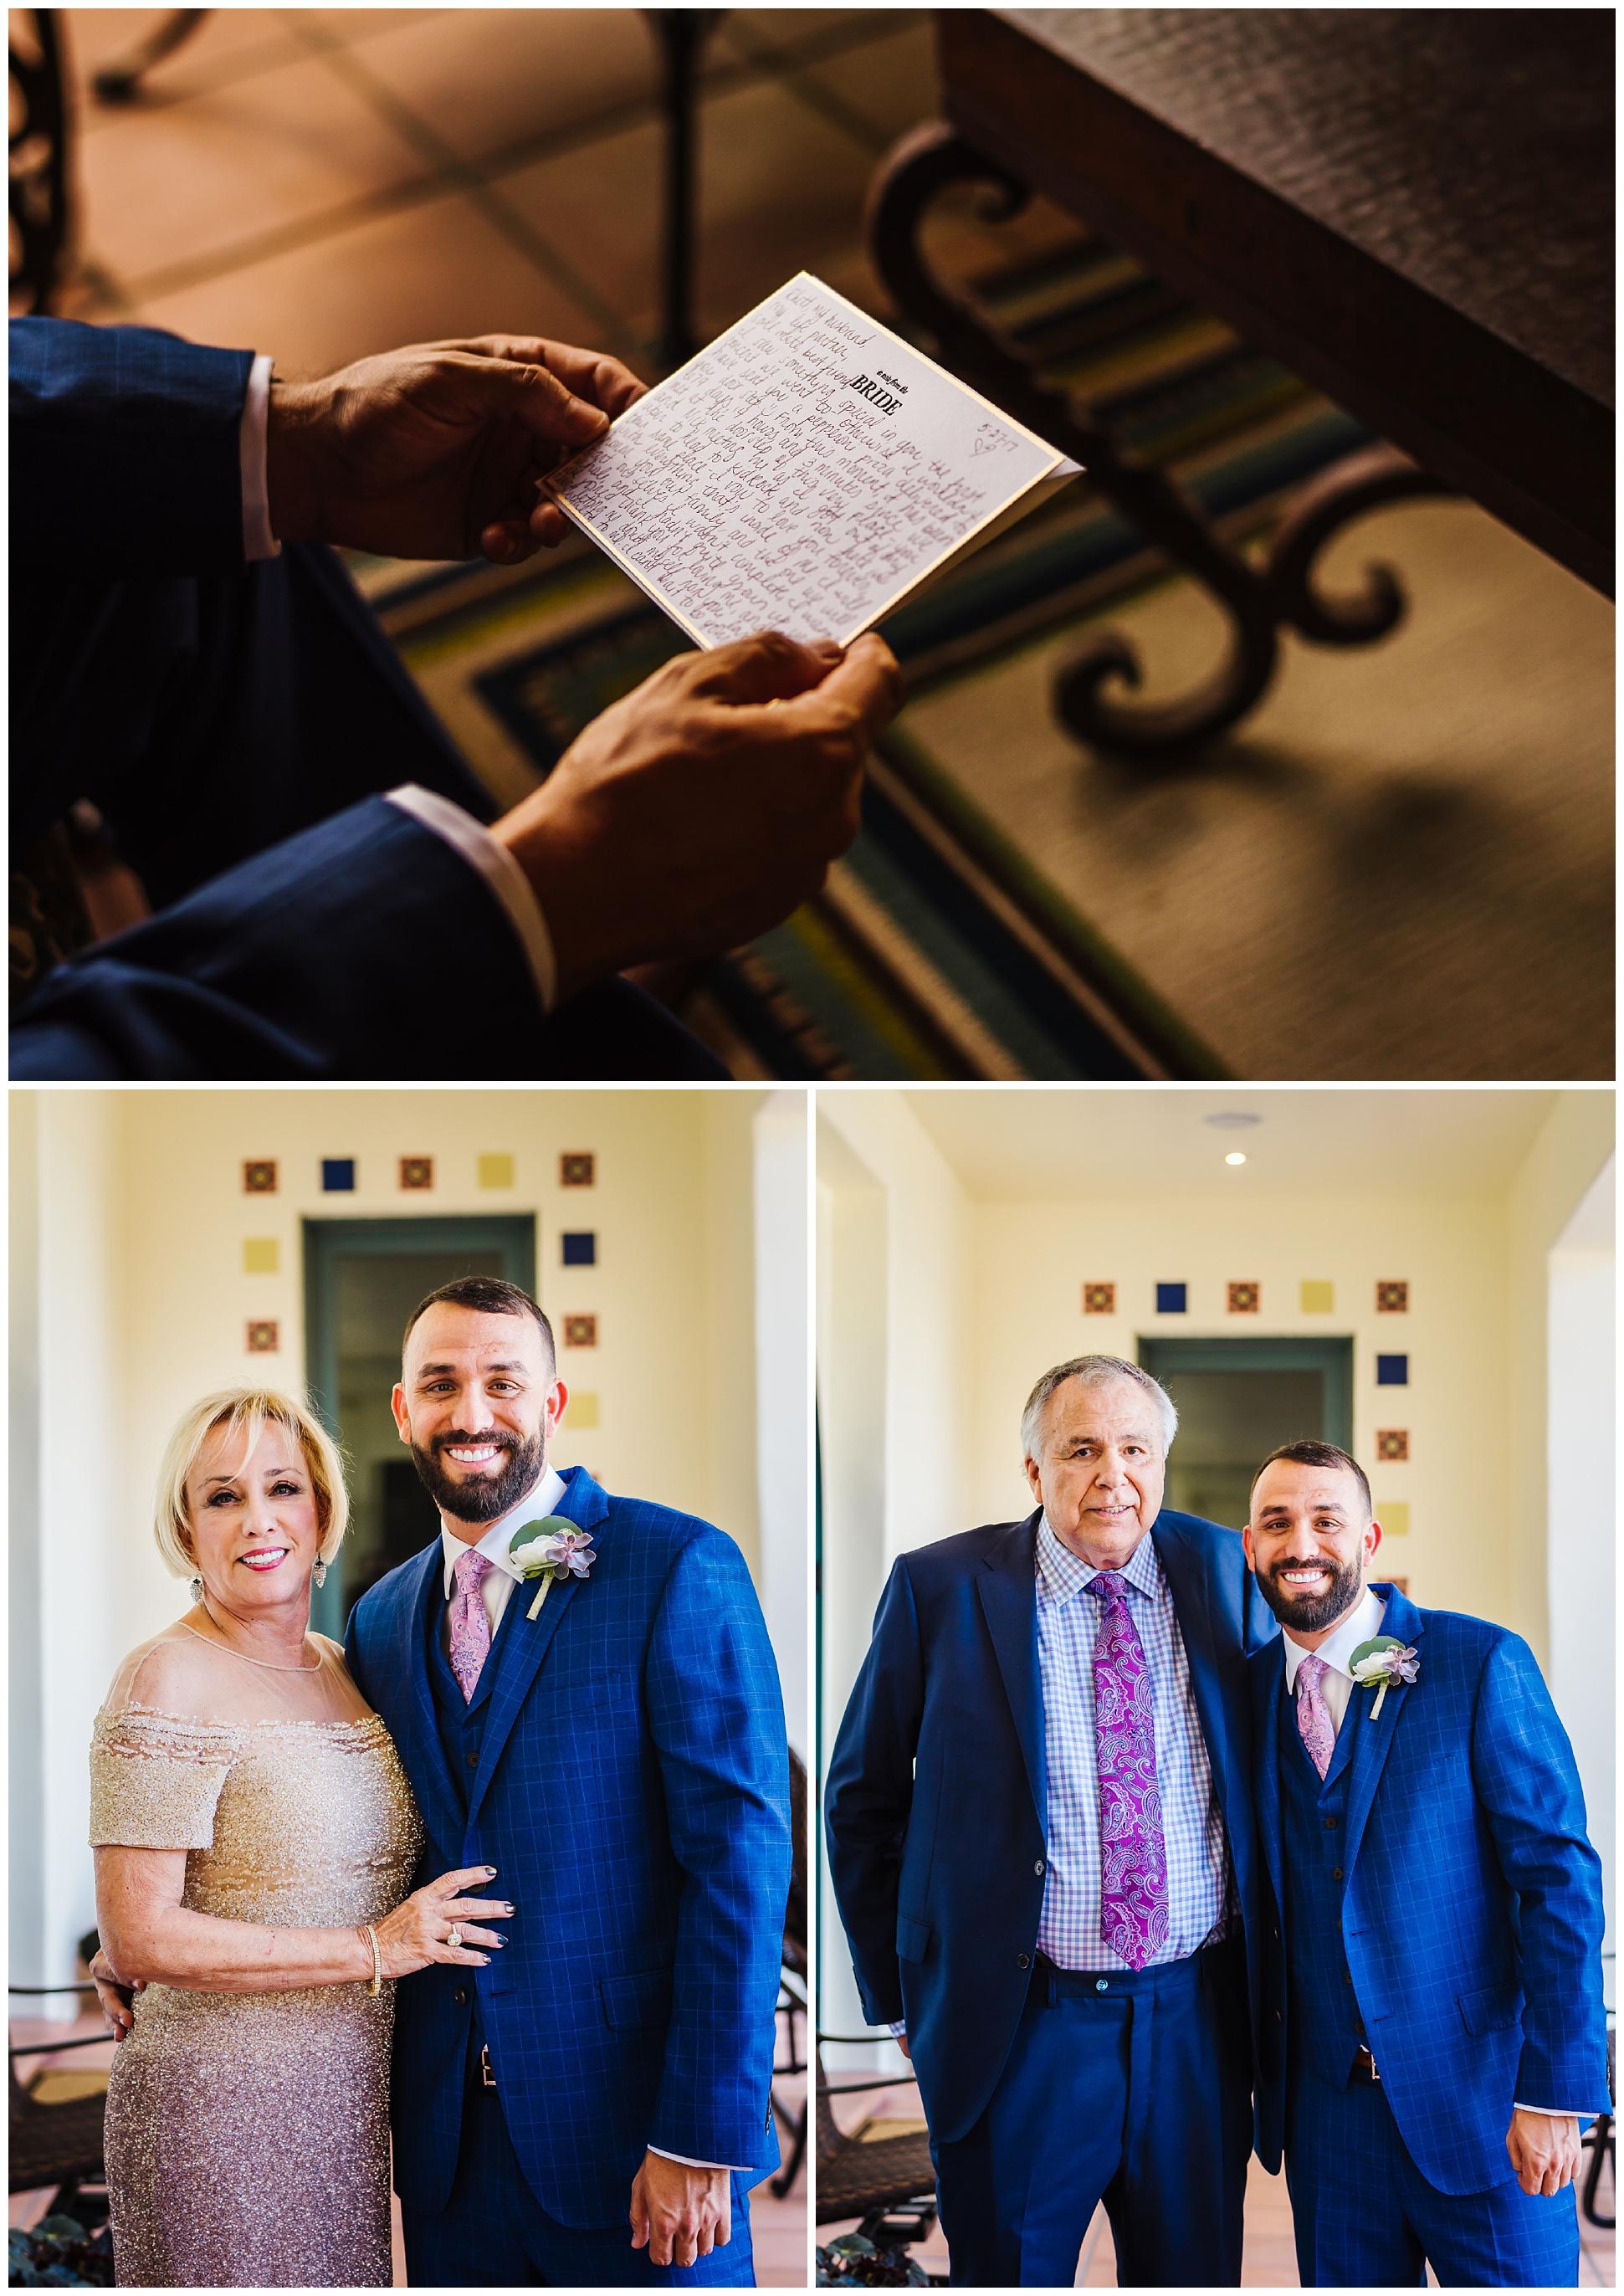 Tampa-luxury-wedding-photographer-mision-lago-private-estate_0017.jpg